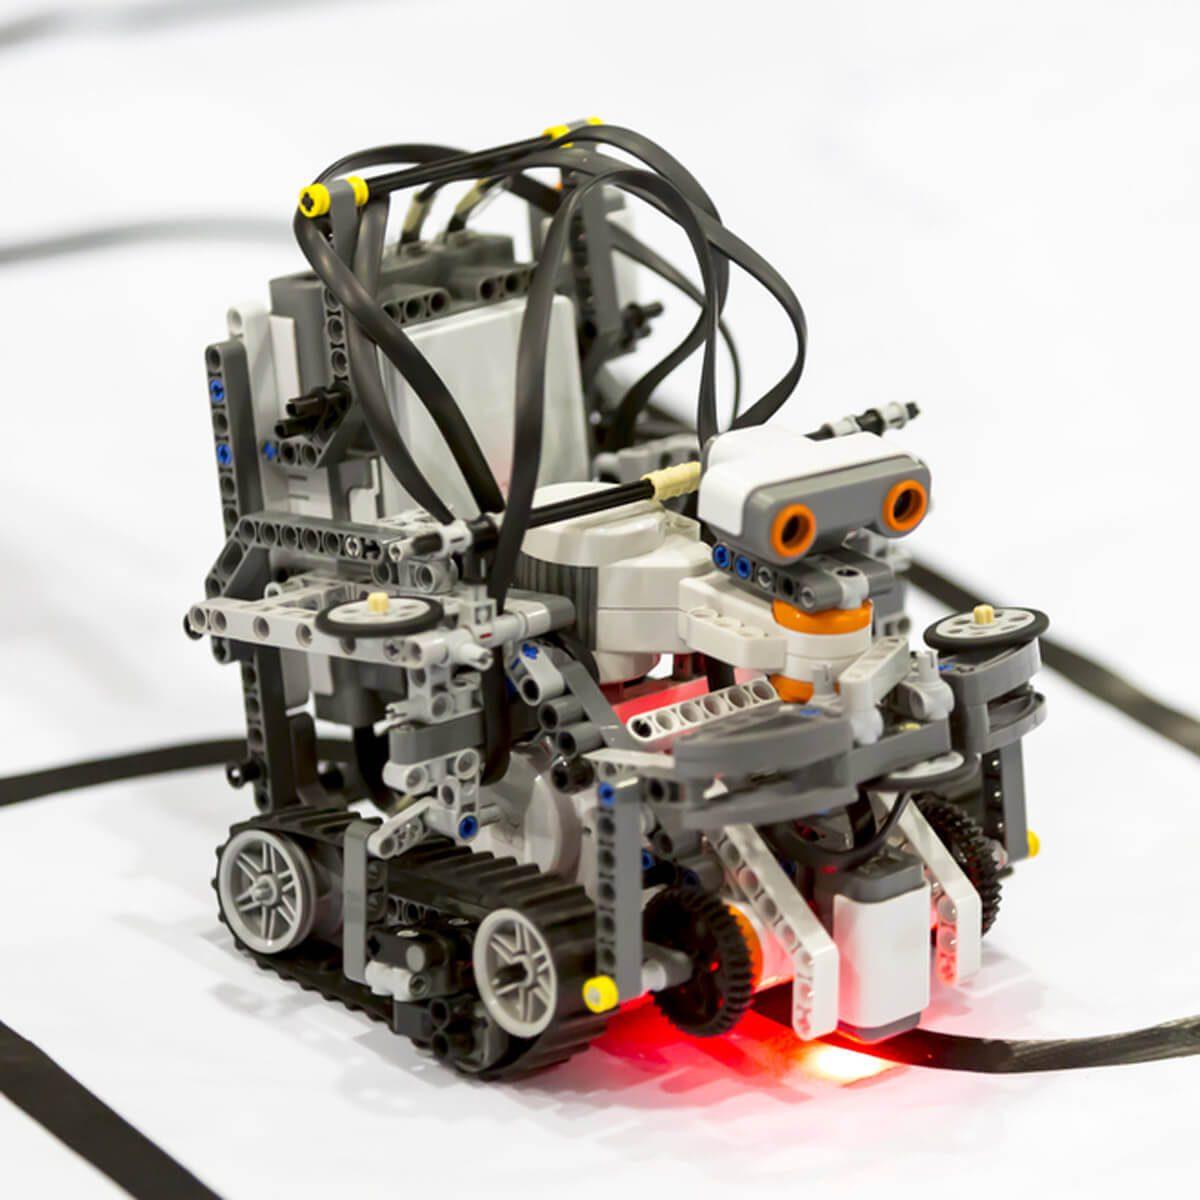 Lego Robots that Work